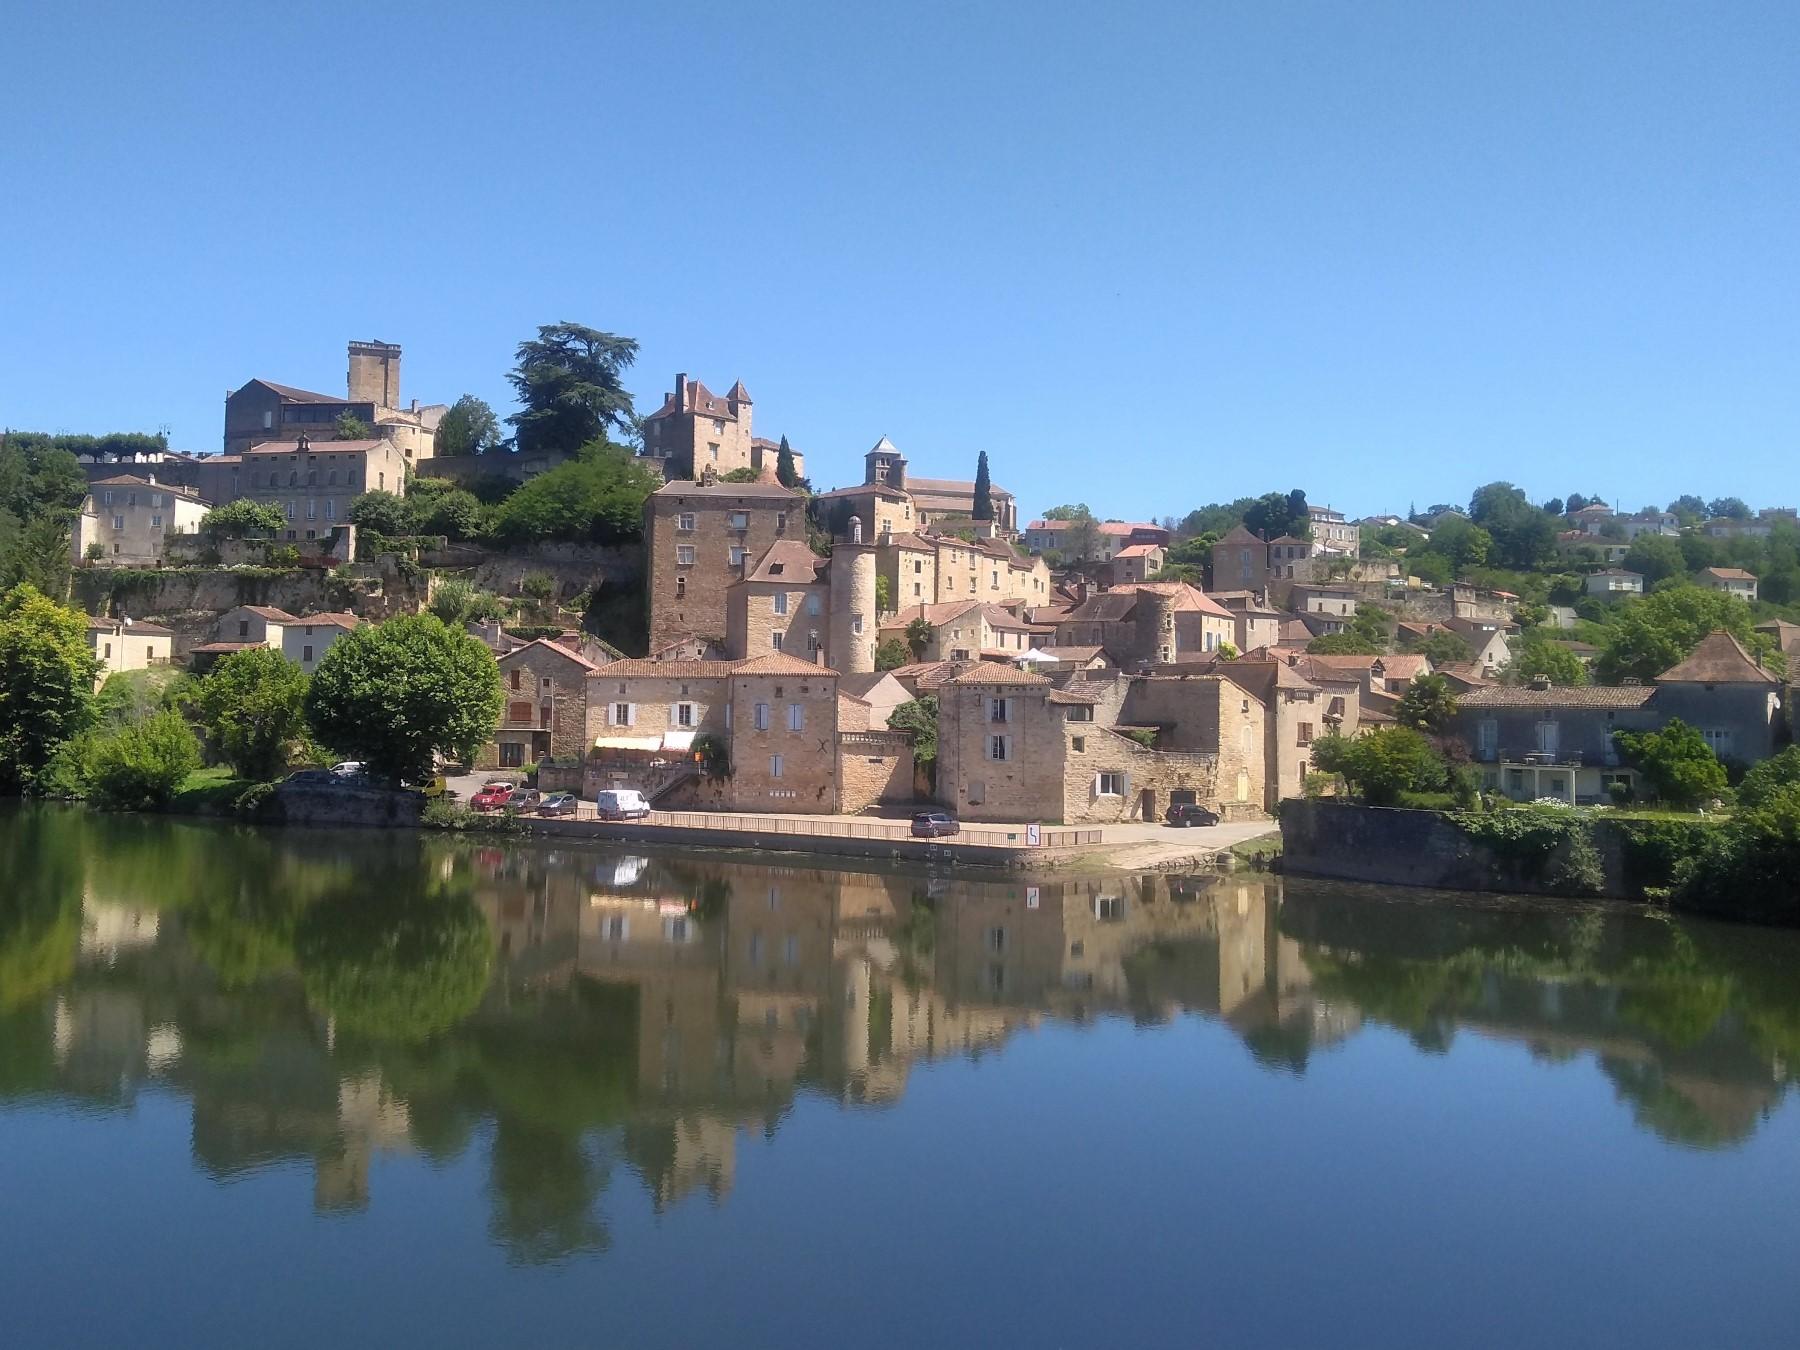 Puy L'Eveque-pc (Aangepast)